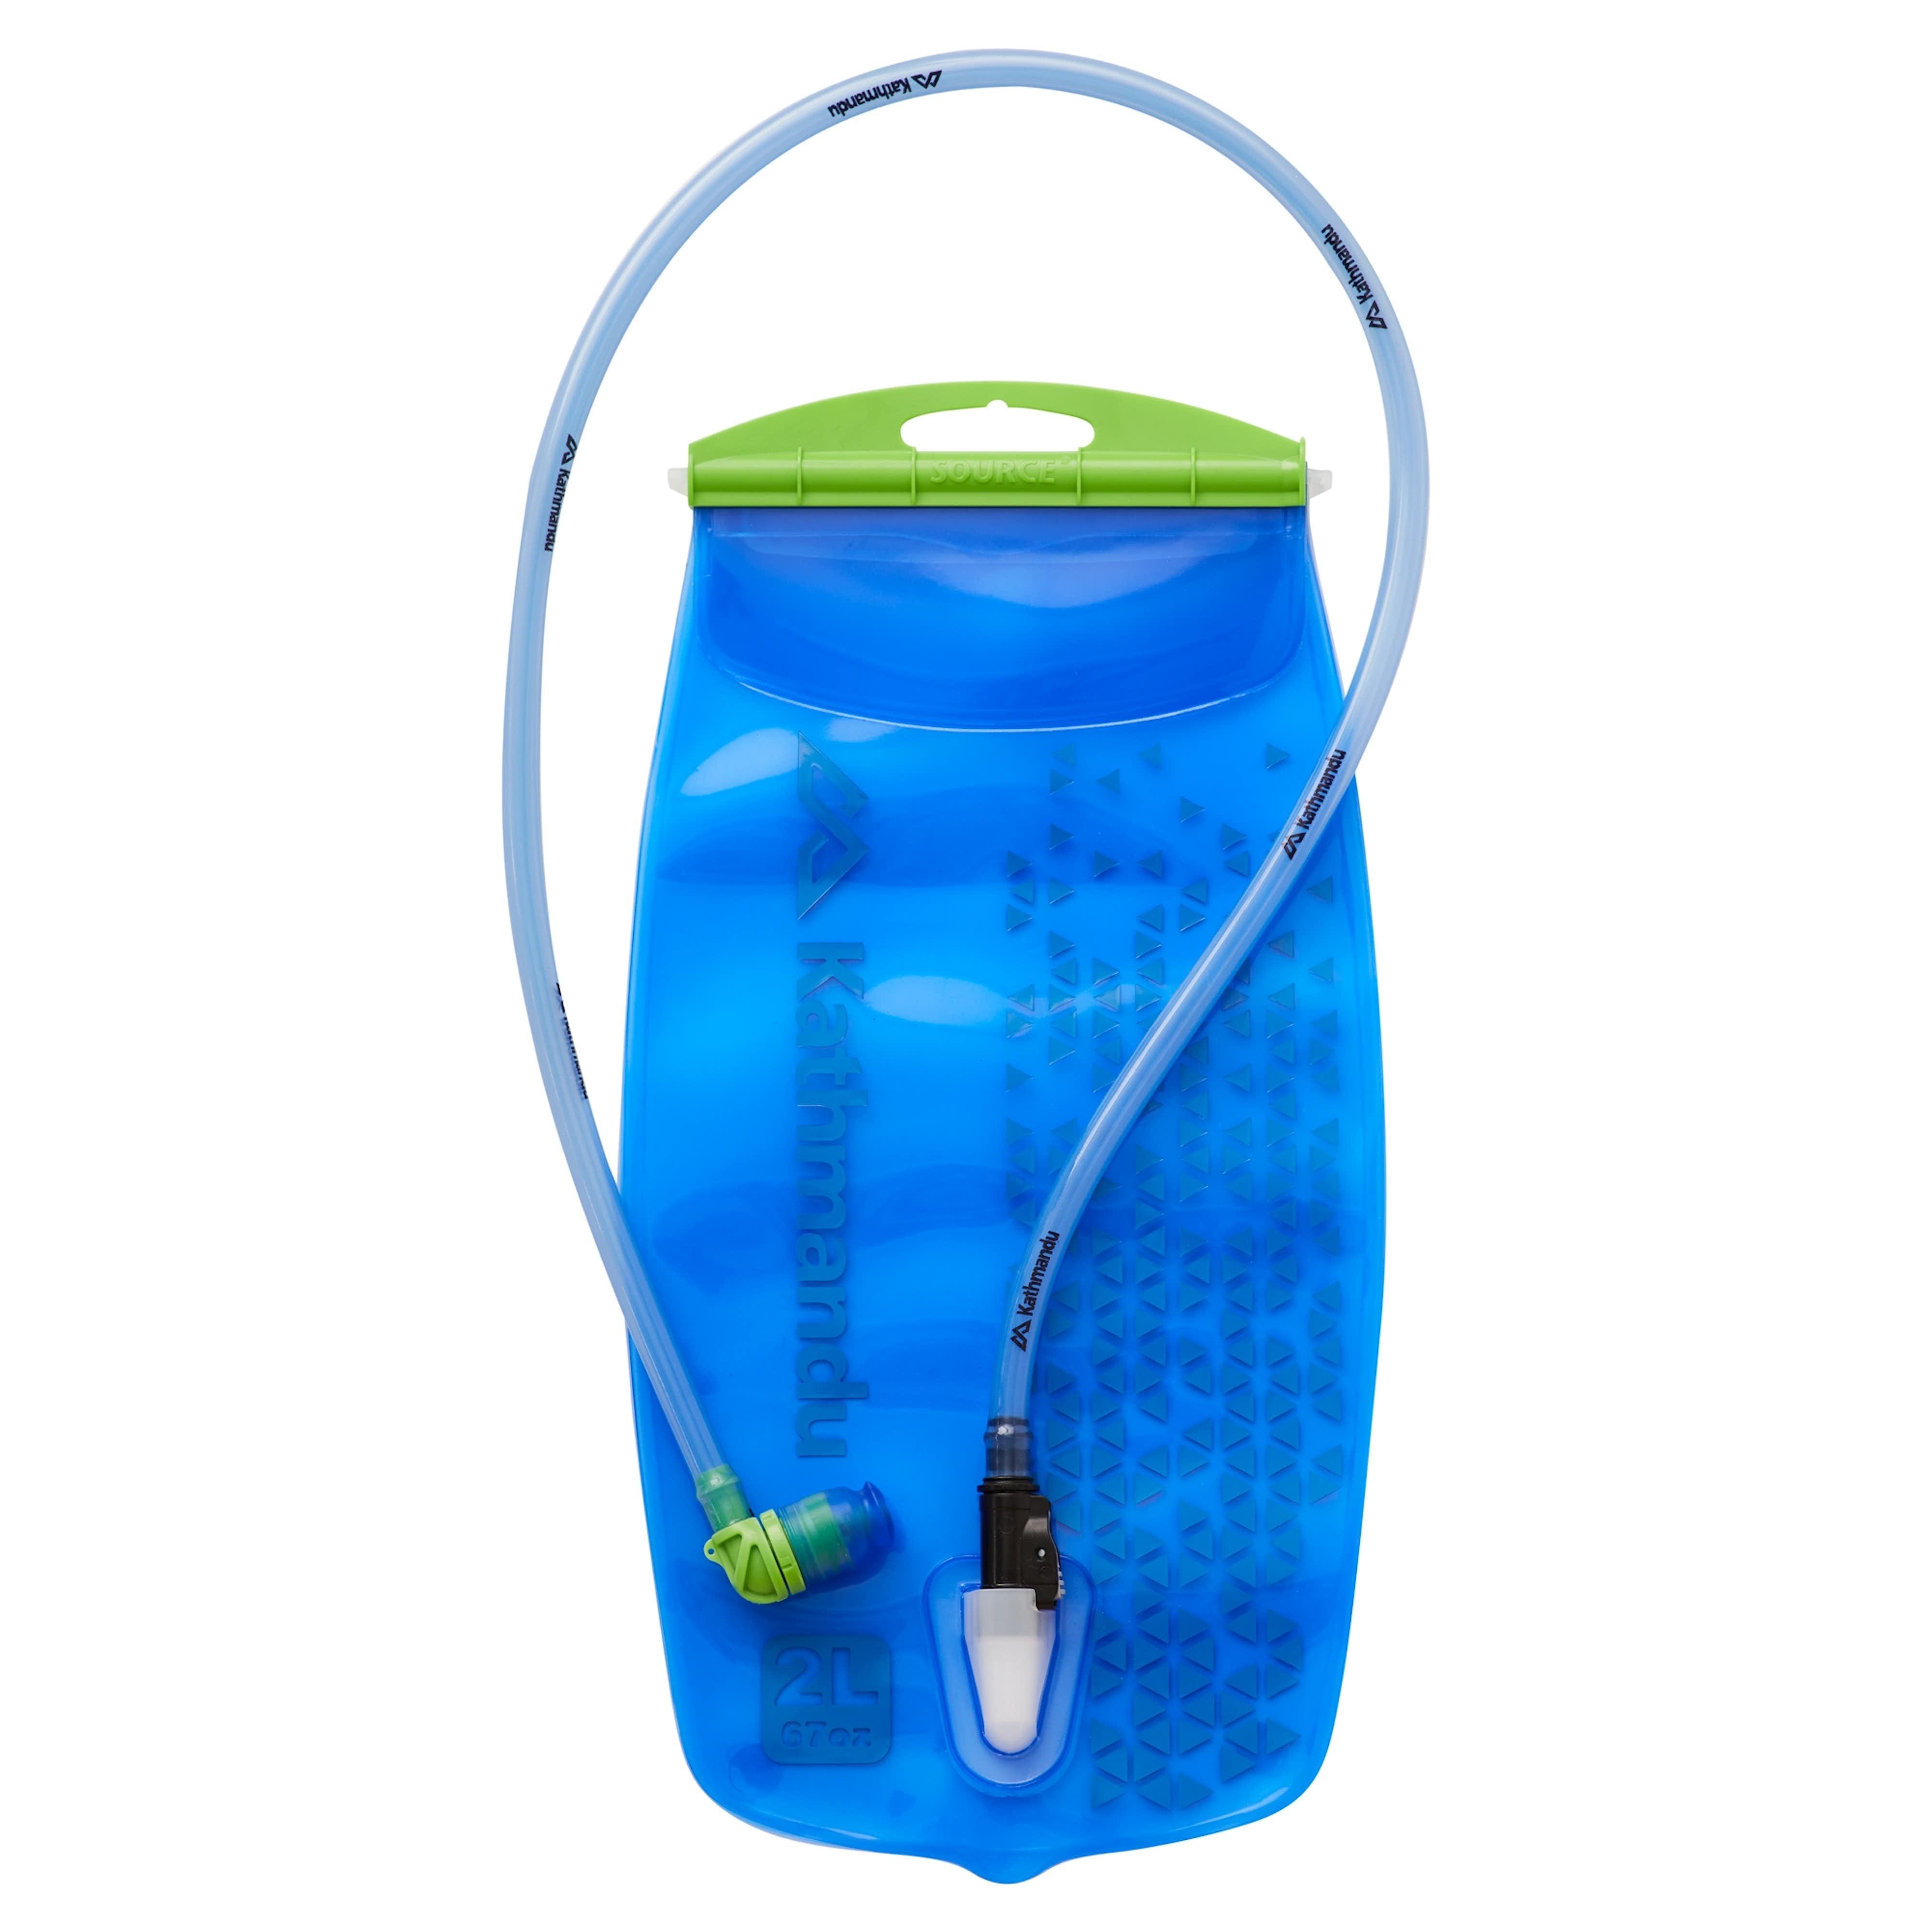 d955fd8fdc Running backpack | Running Packs, Bags for women & men | NZ